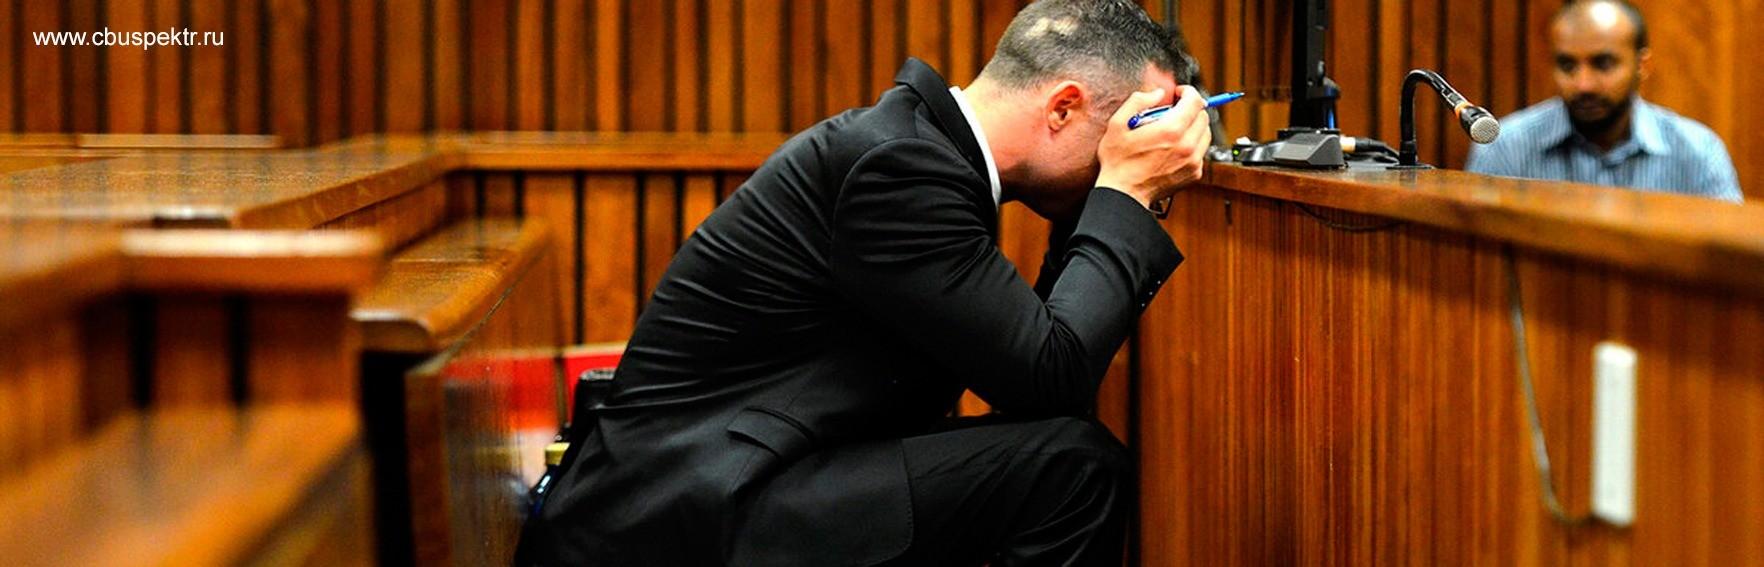 человек в зале суда плачет